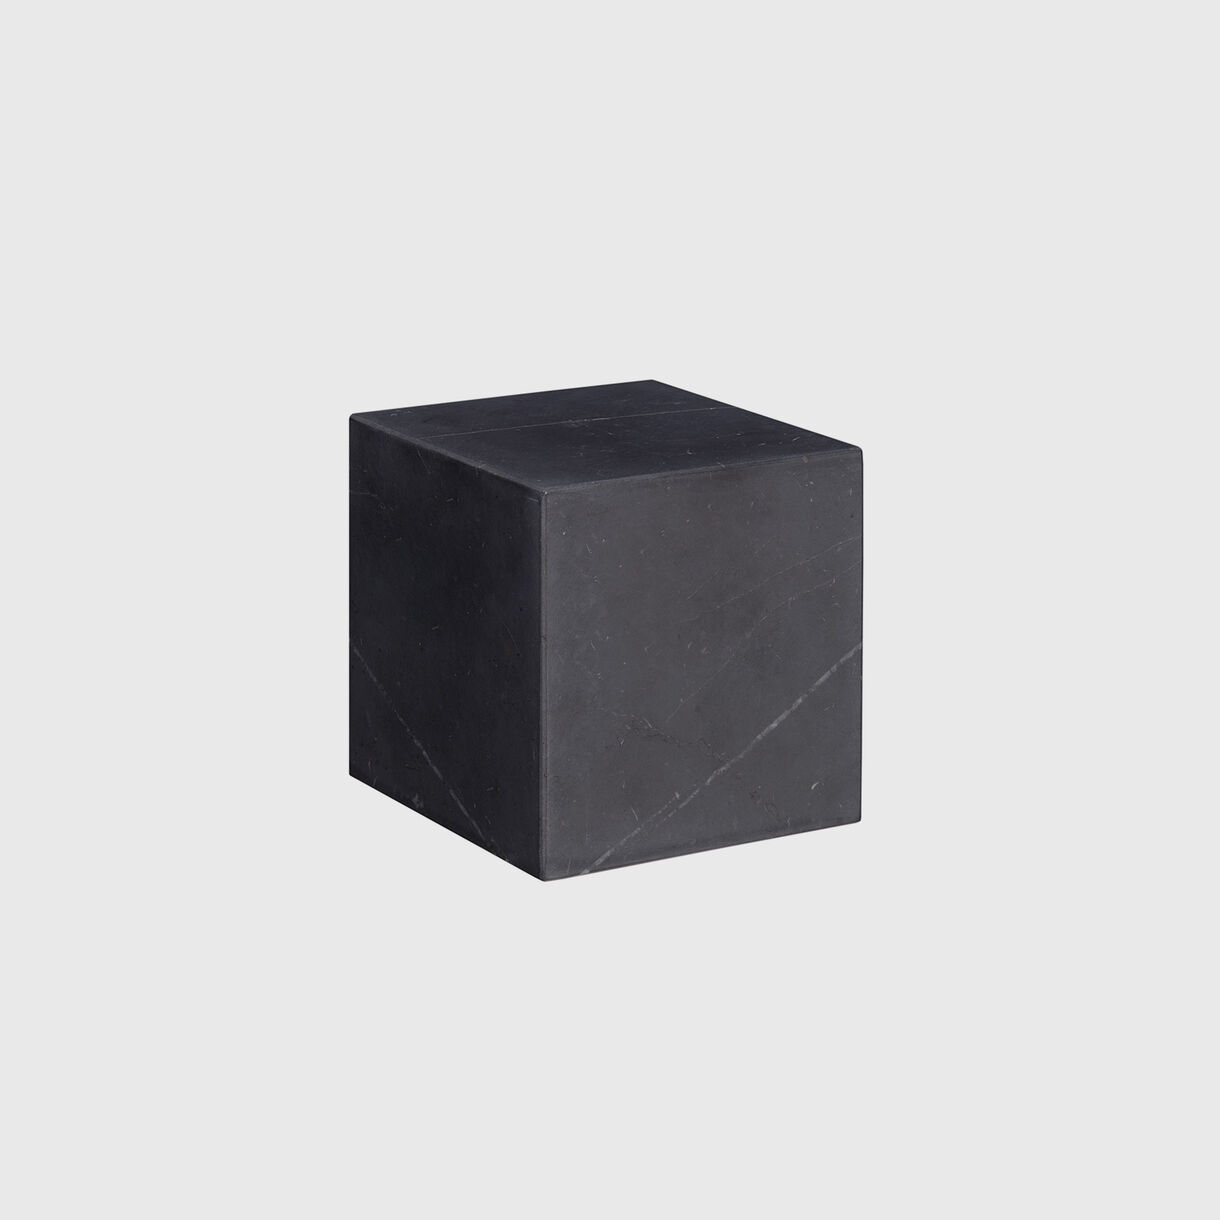 Stop Bookend, Black Carrara Marble, Small